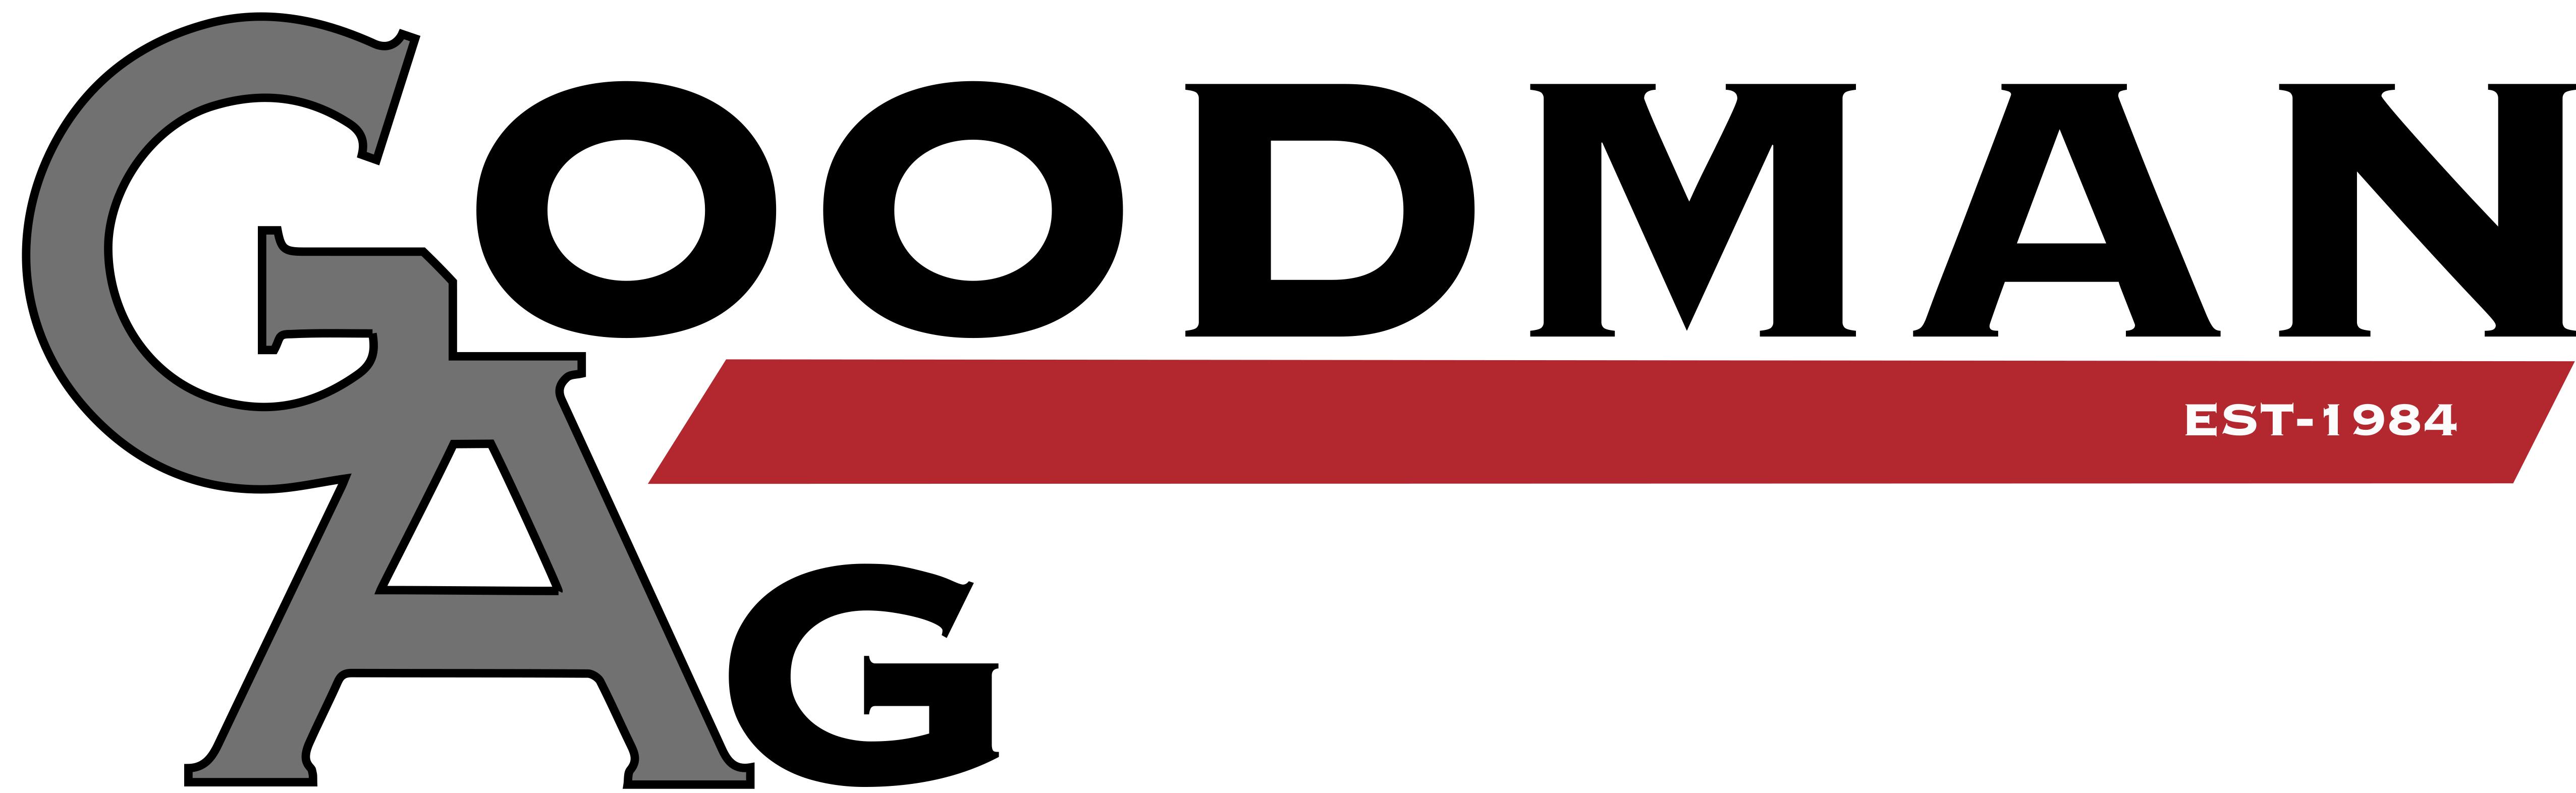 Goodman Ag